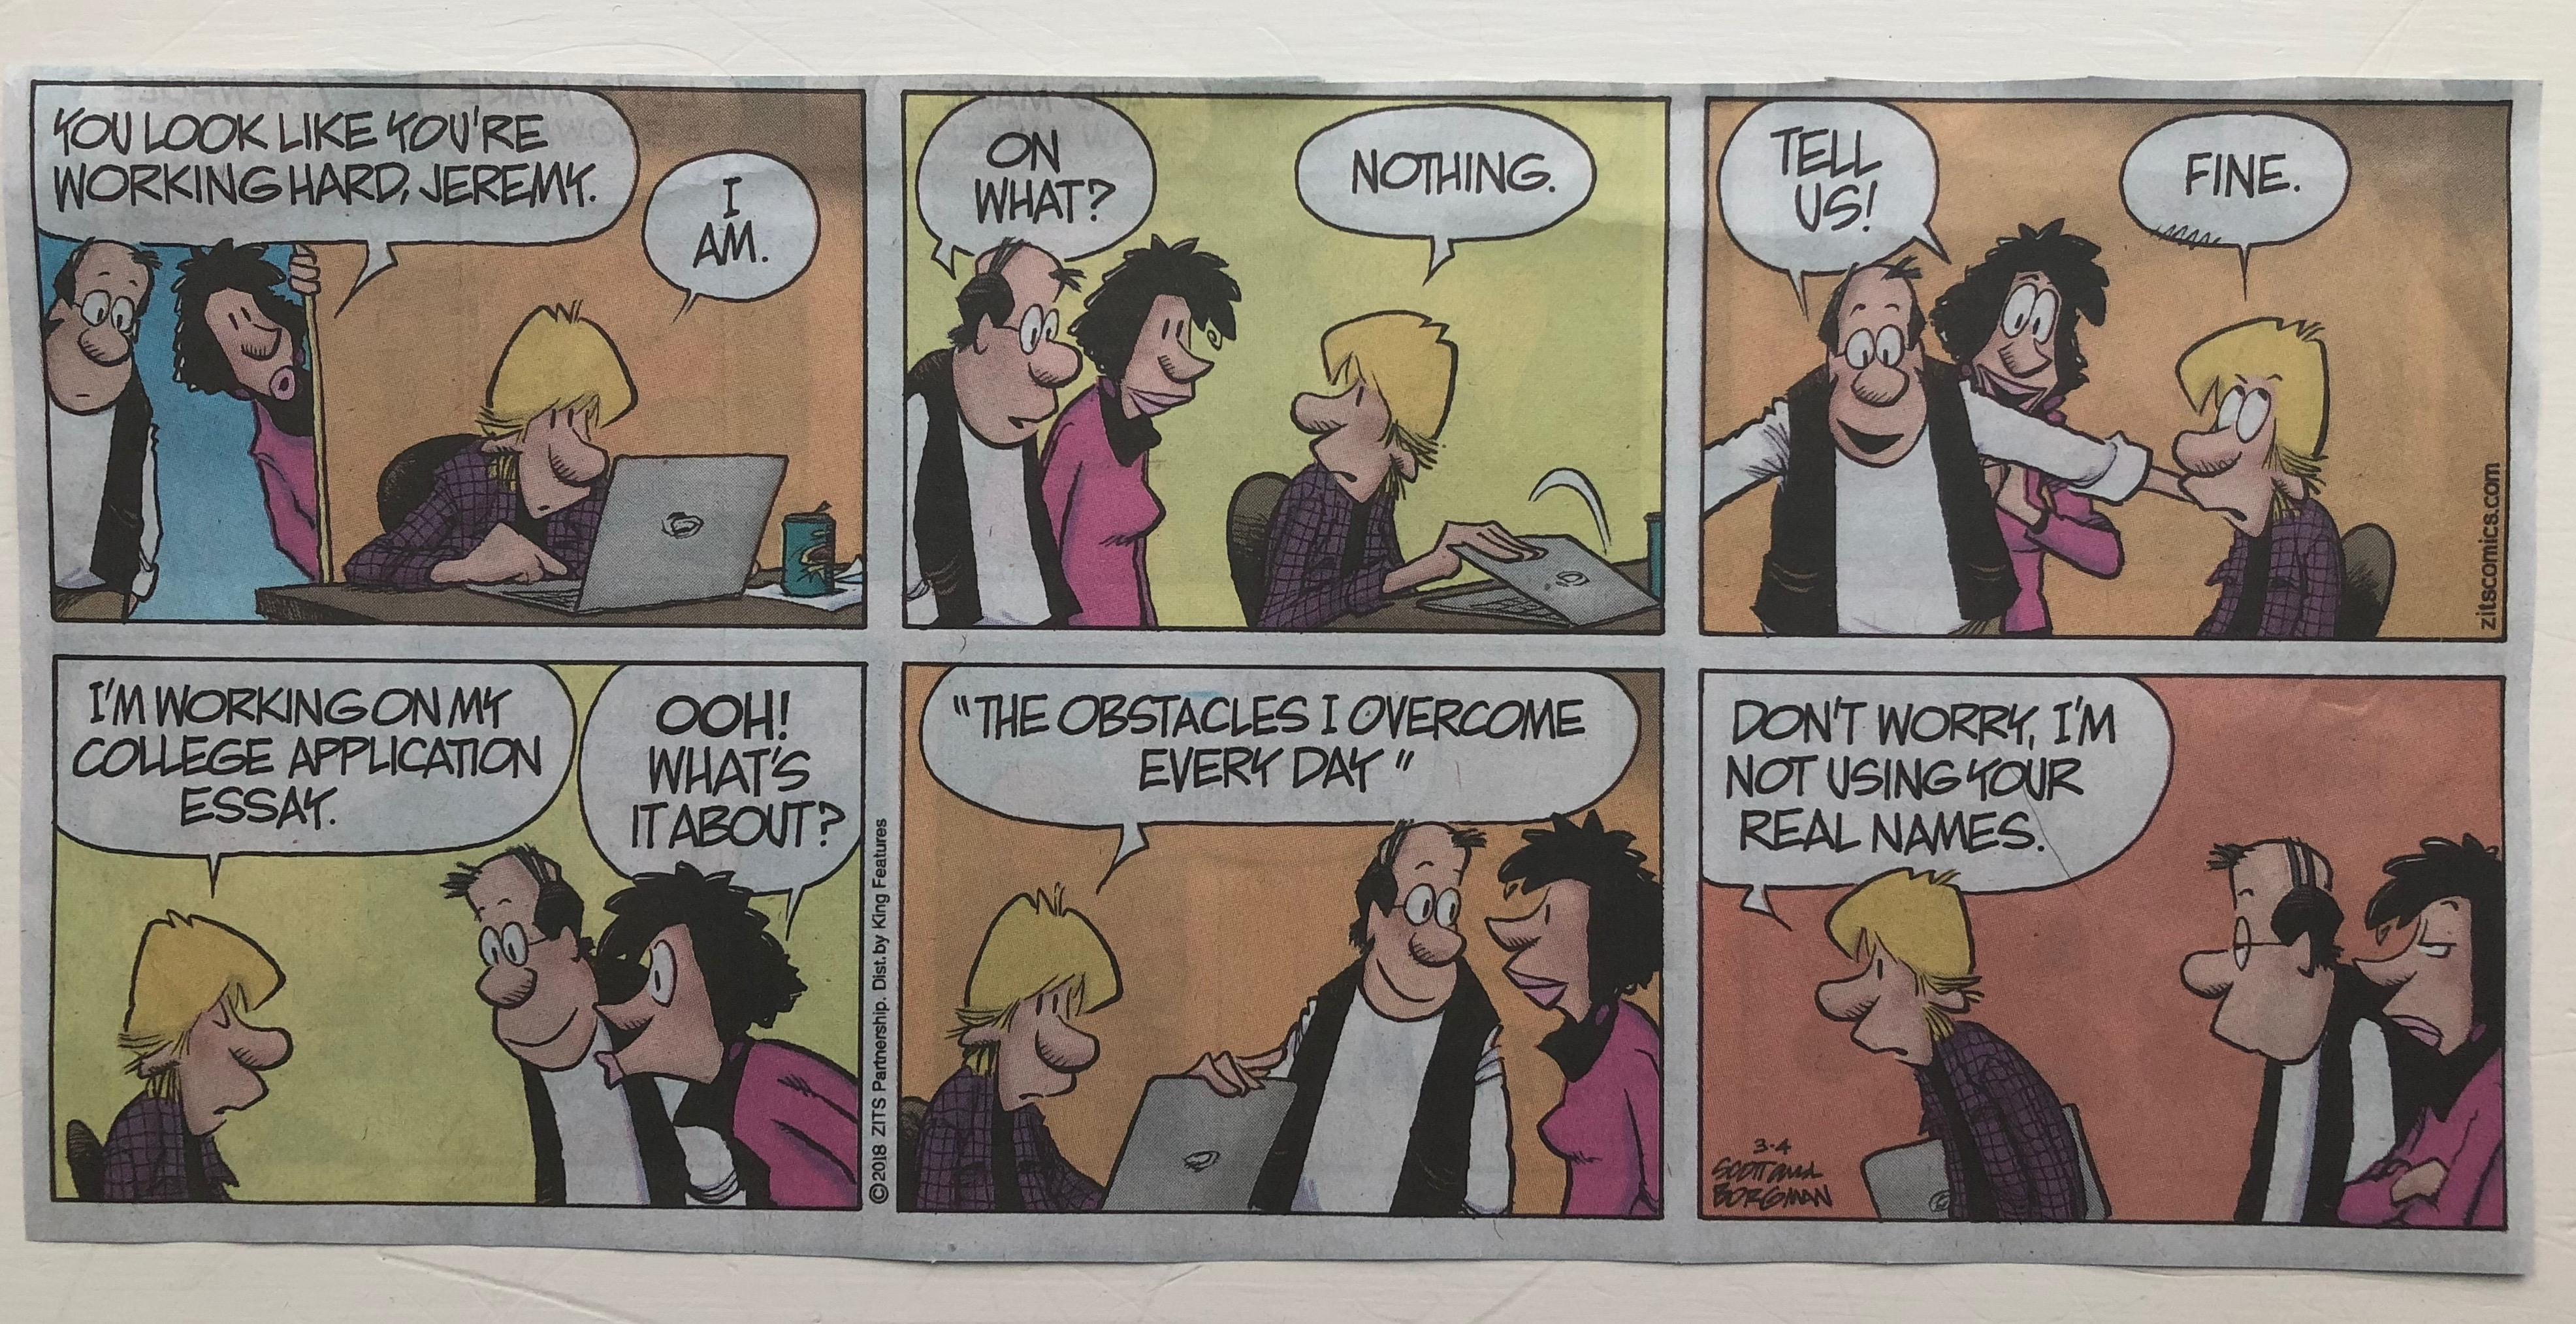 College essay cartoon .jpg